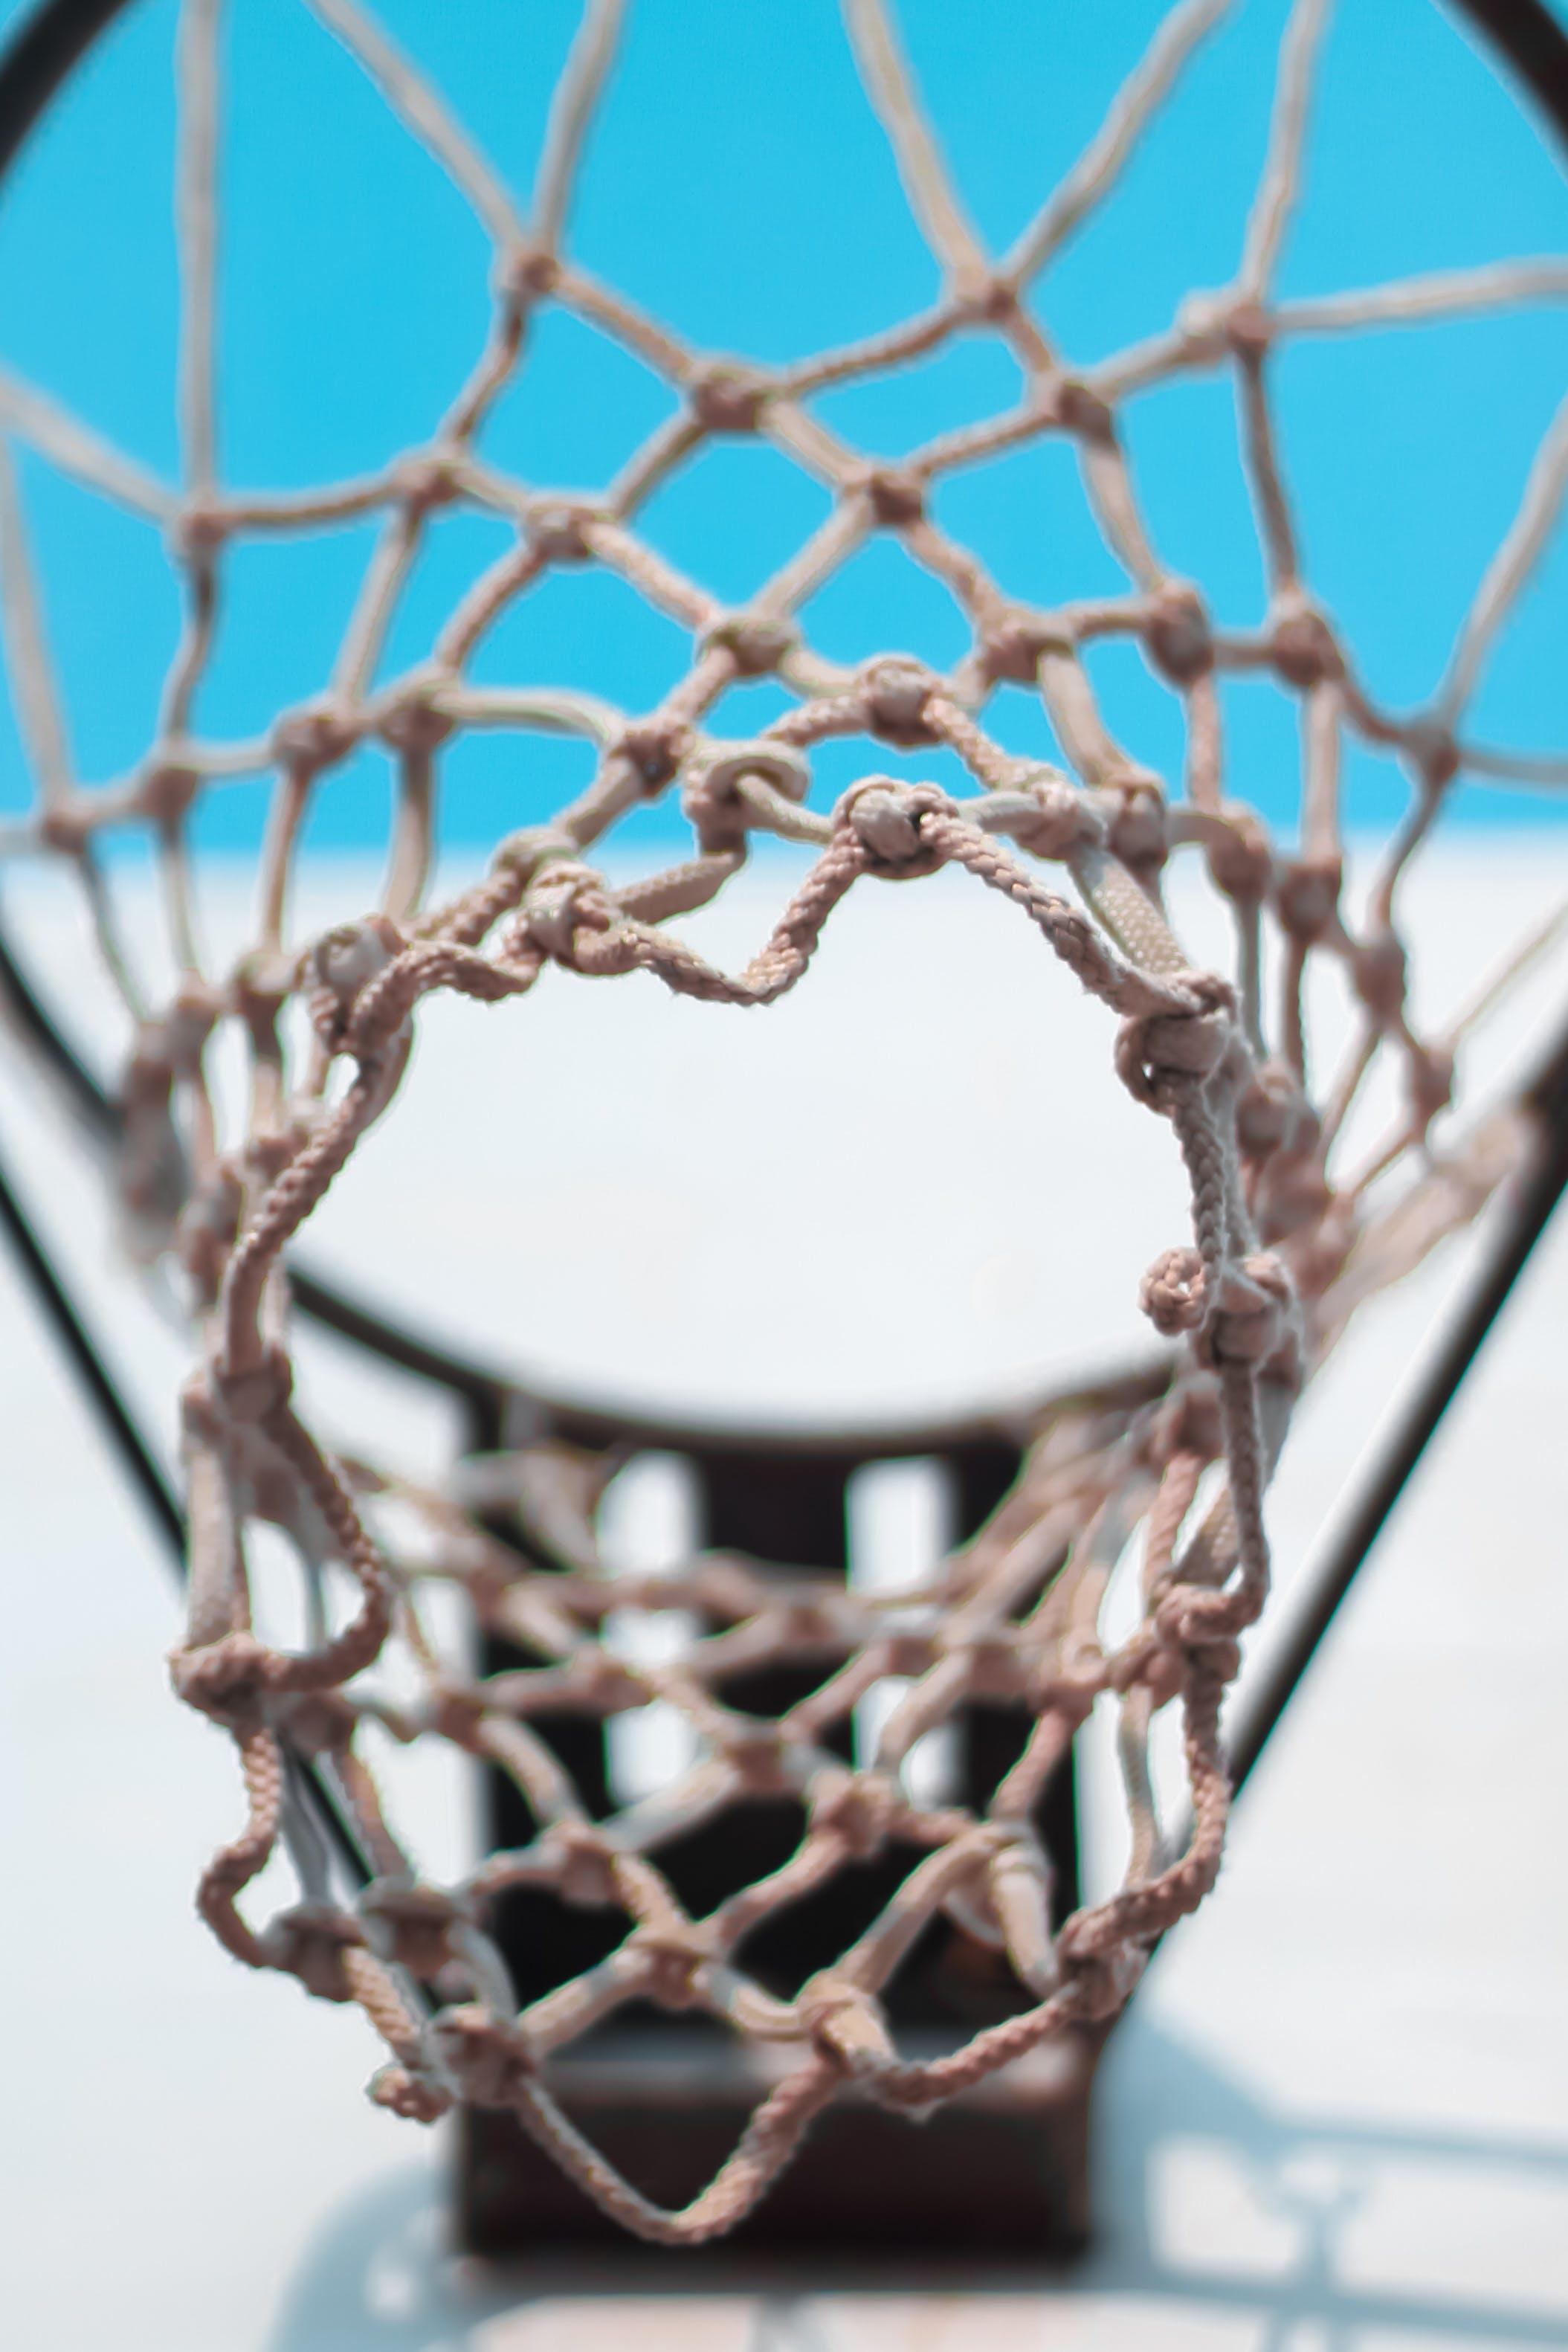 Free stock photo of ball, basketball, Basketball Hoop, close up